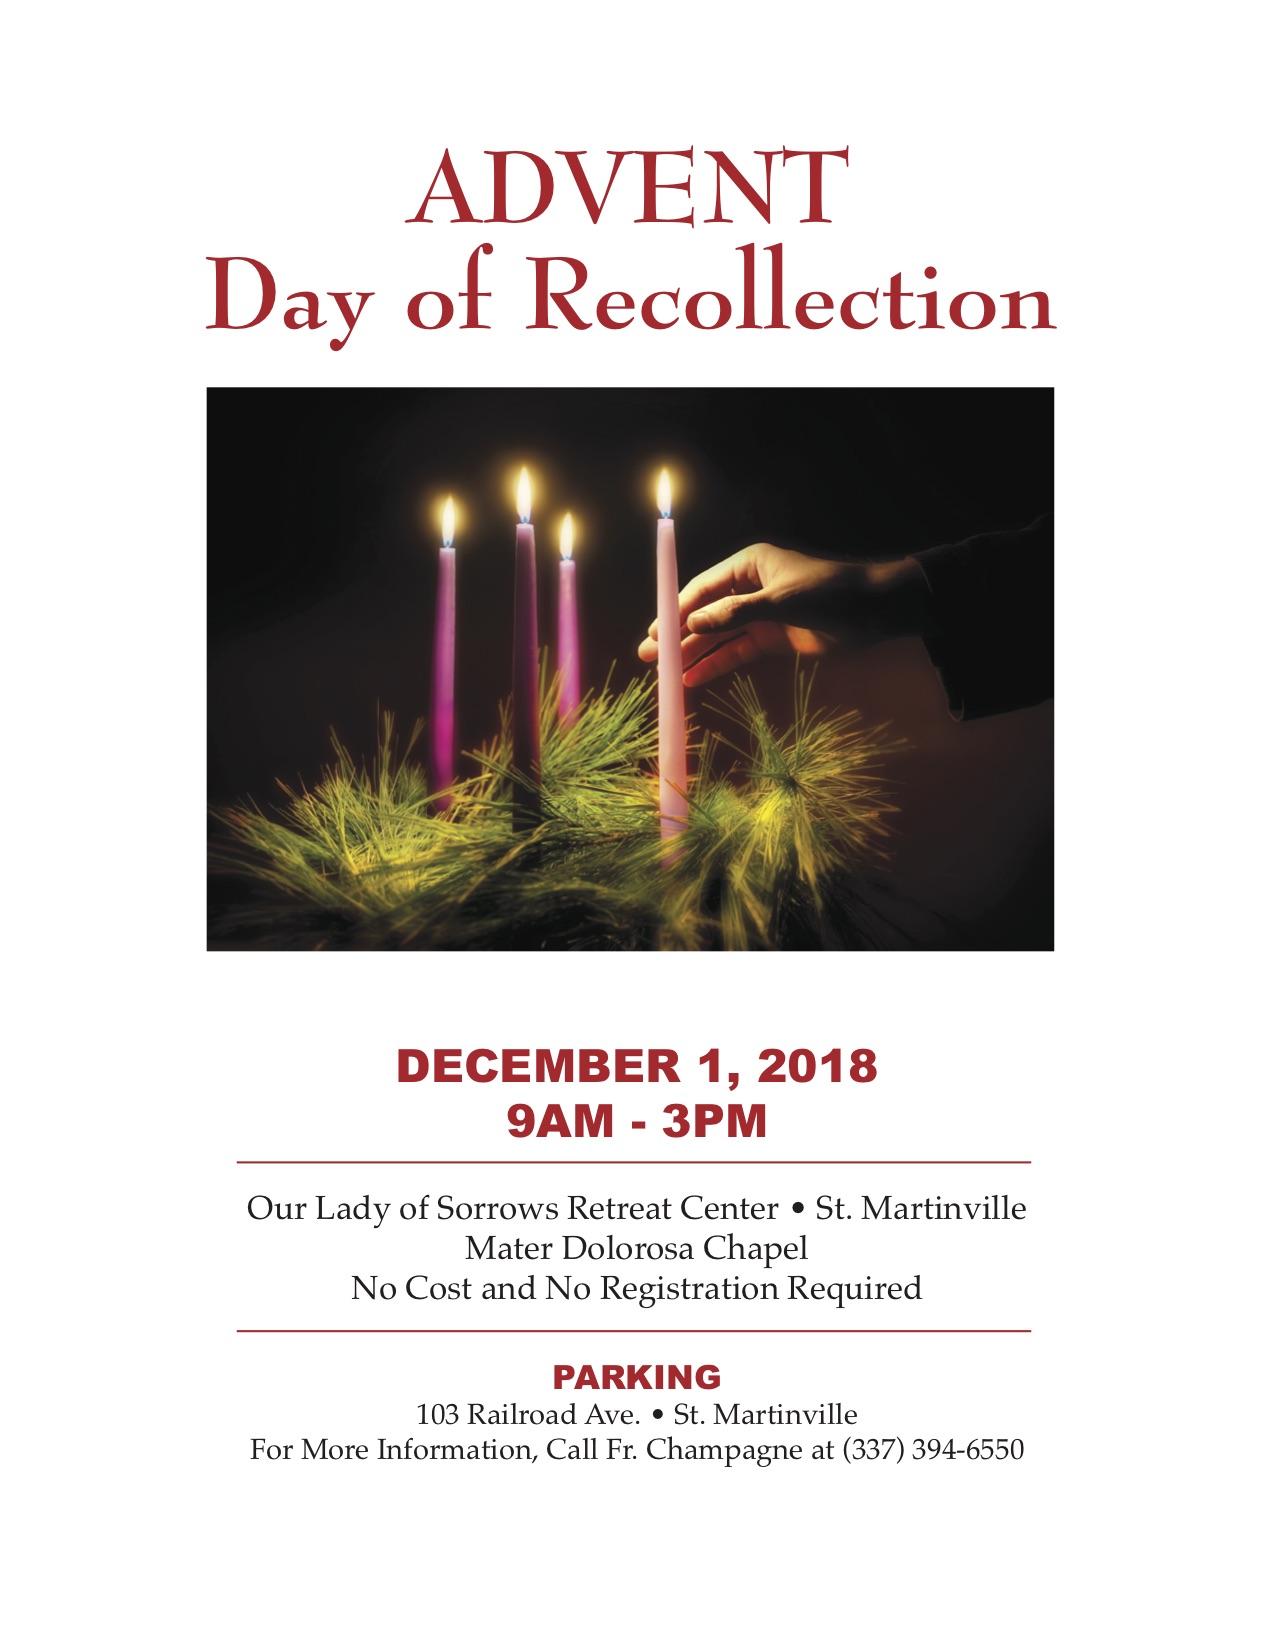 Day of Rec Advent.jpg